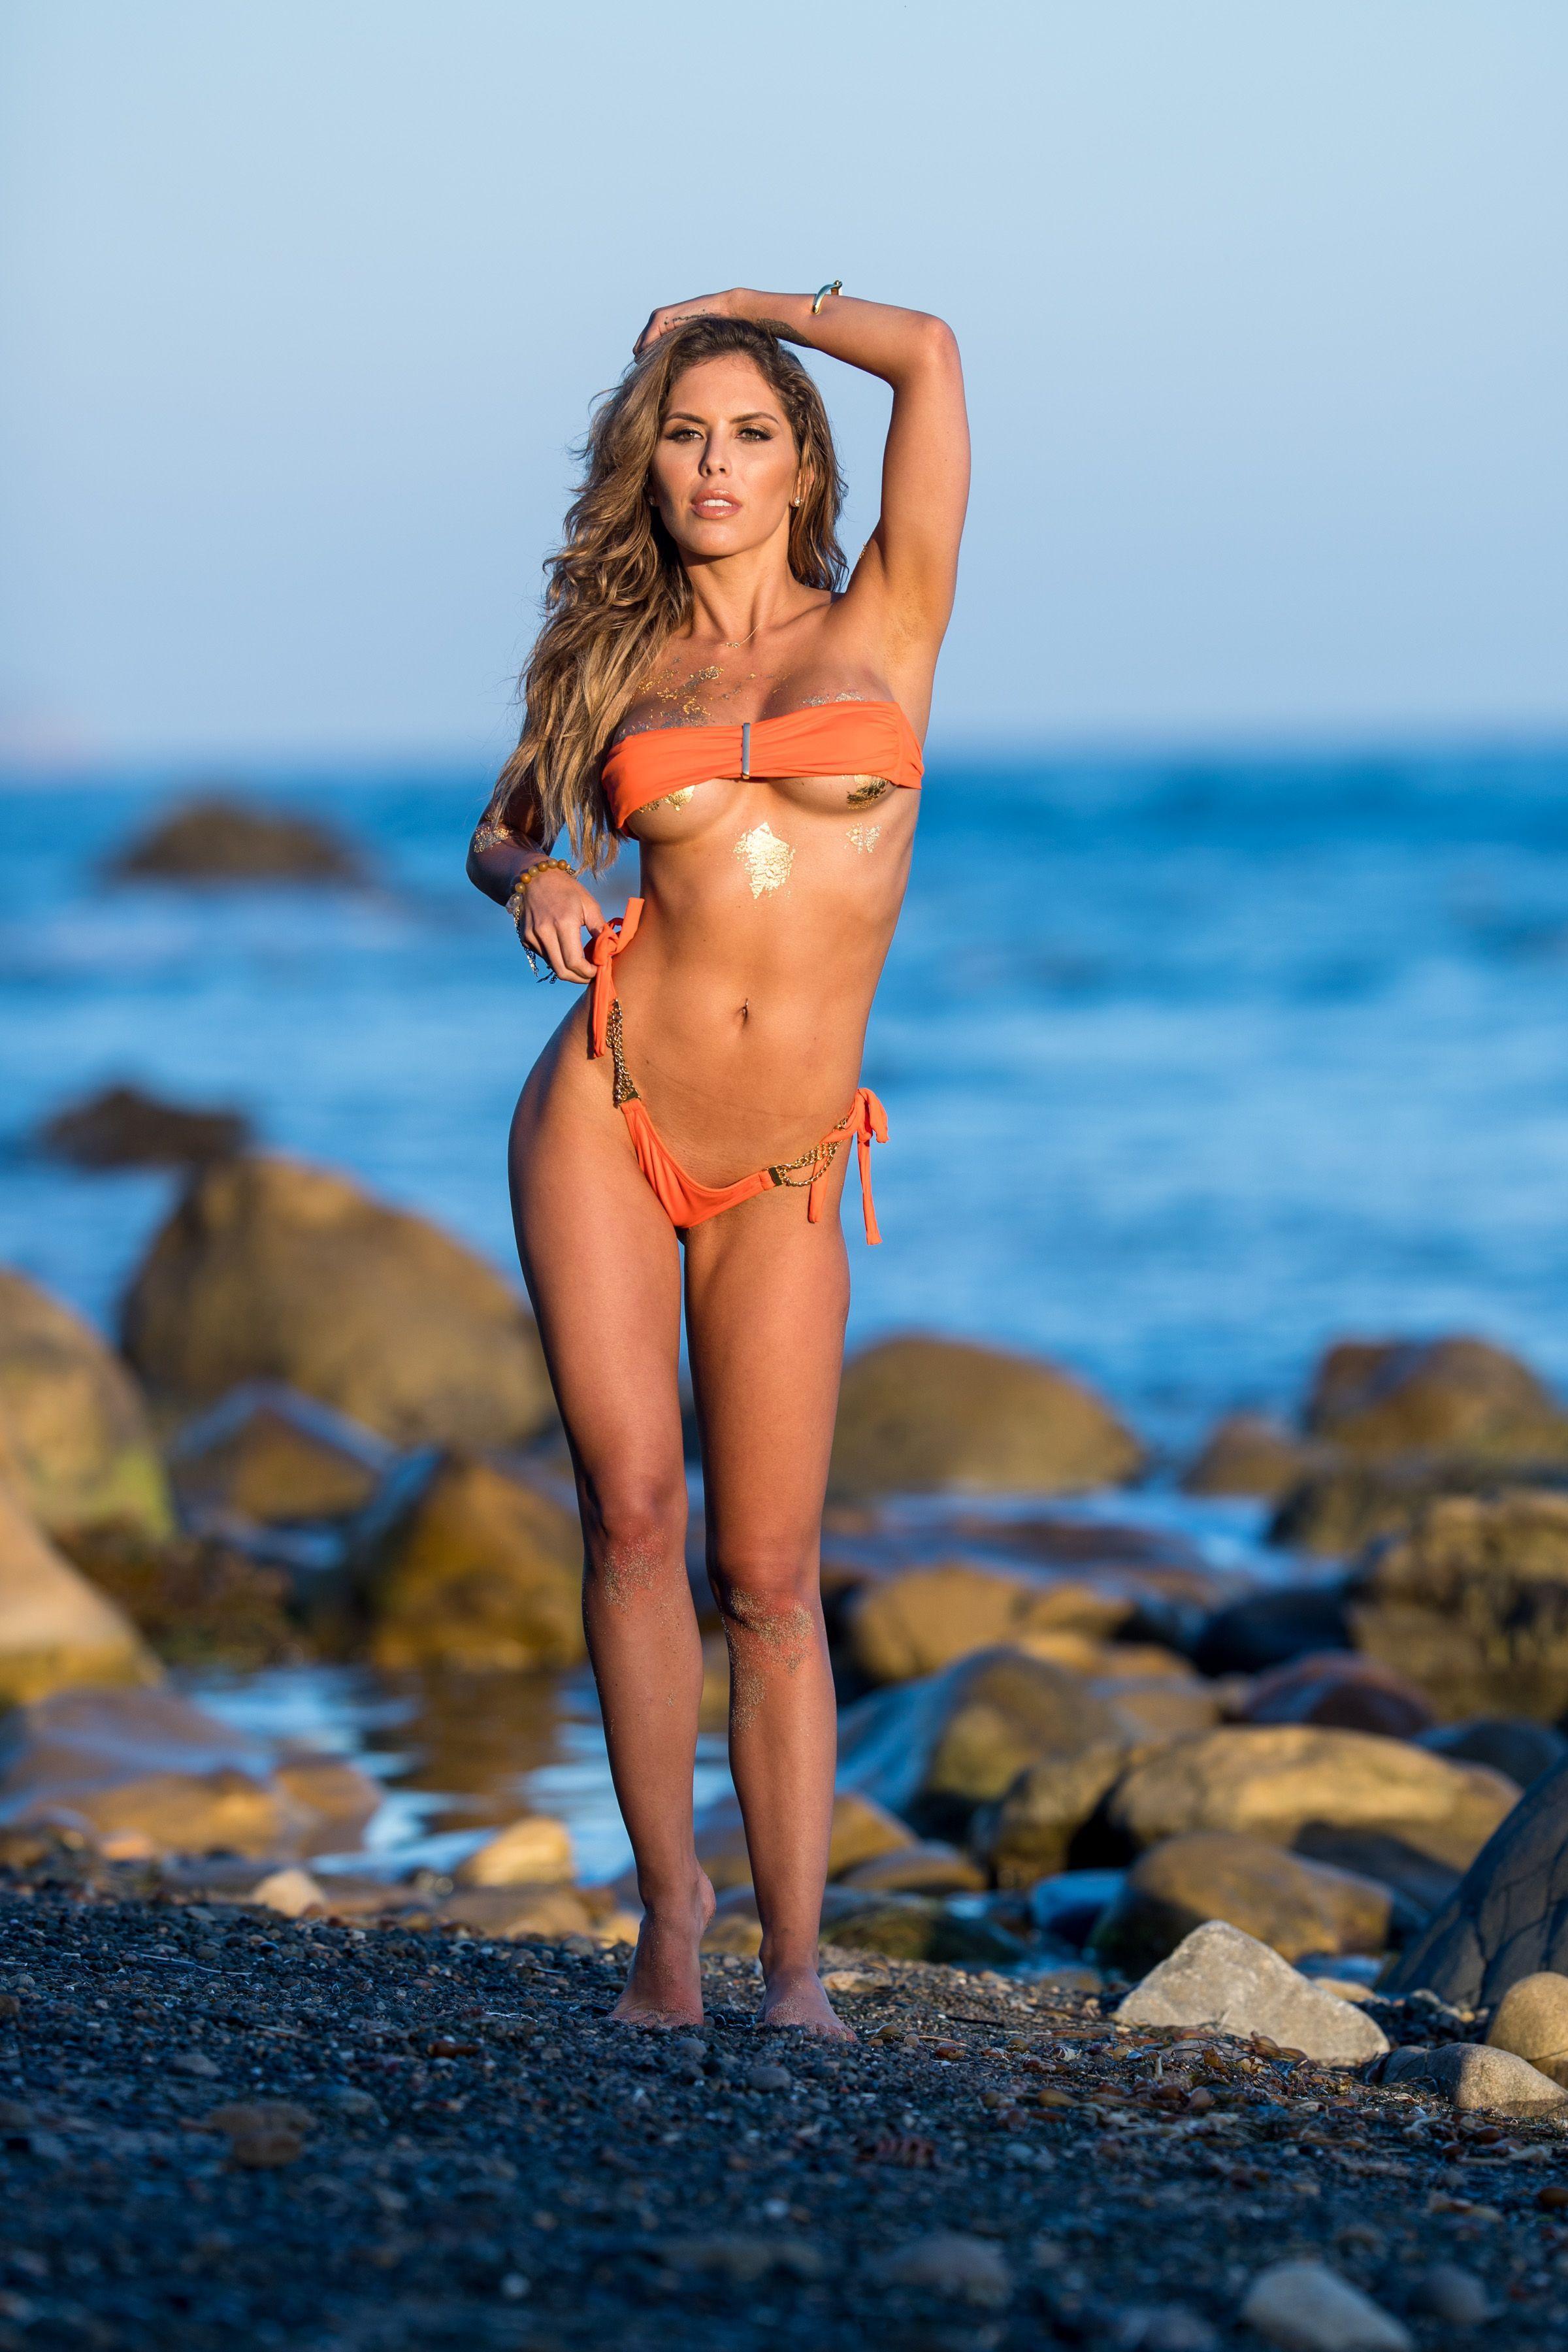 Brittney-Palmer-Sexy-Topless-32-thefappeningblog.com_.jpg